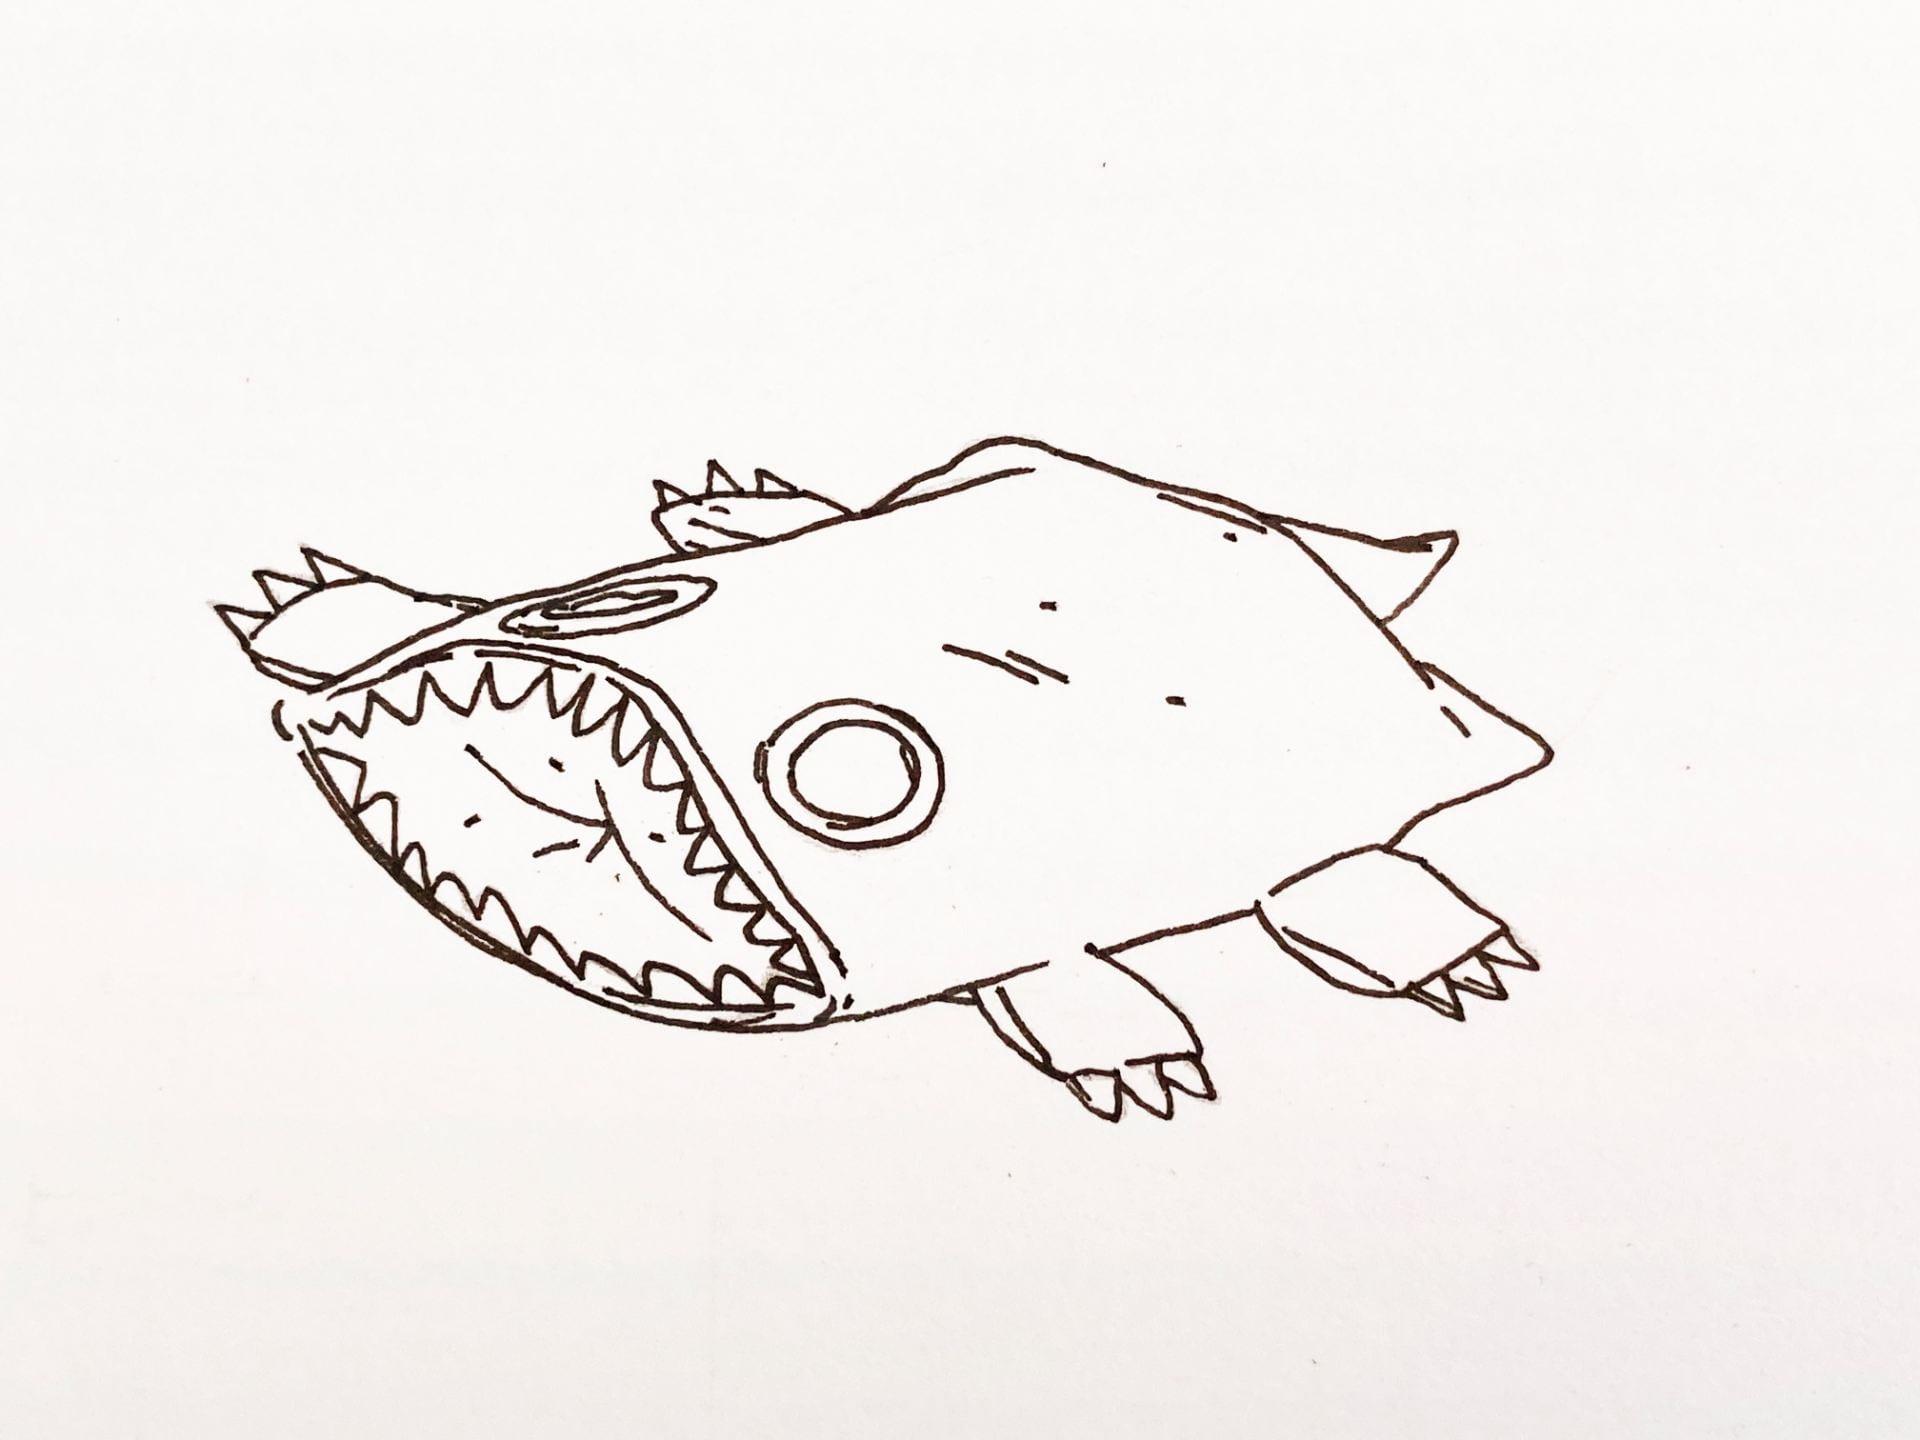 Pillow Monster